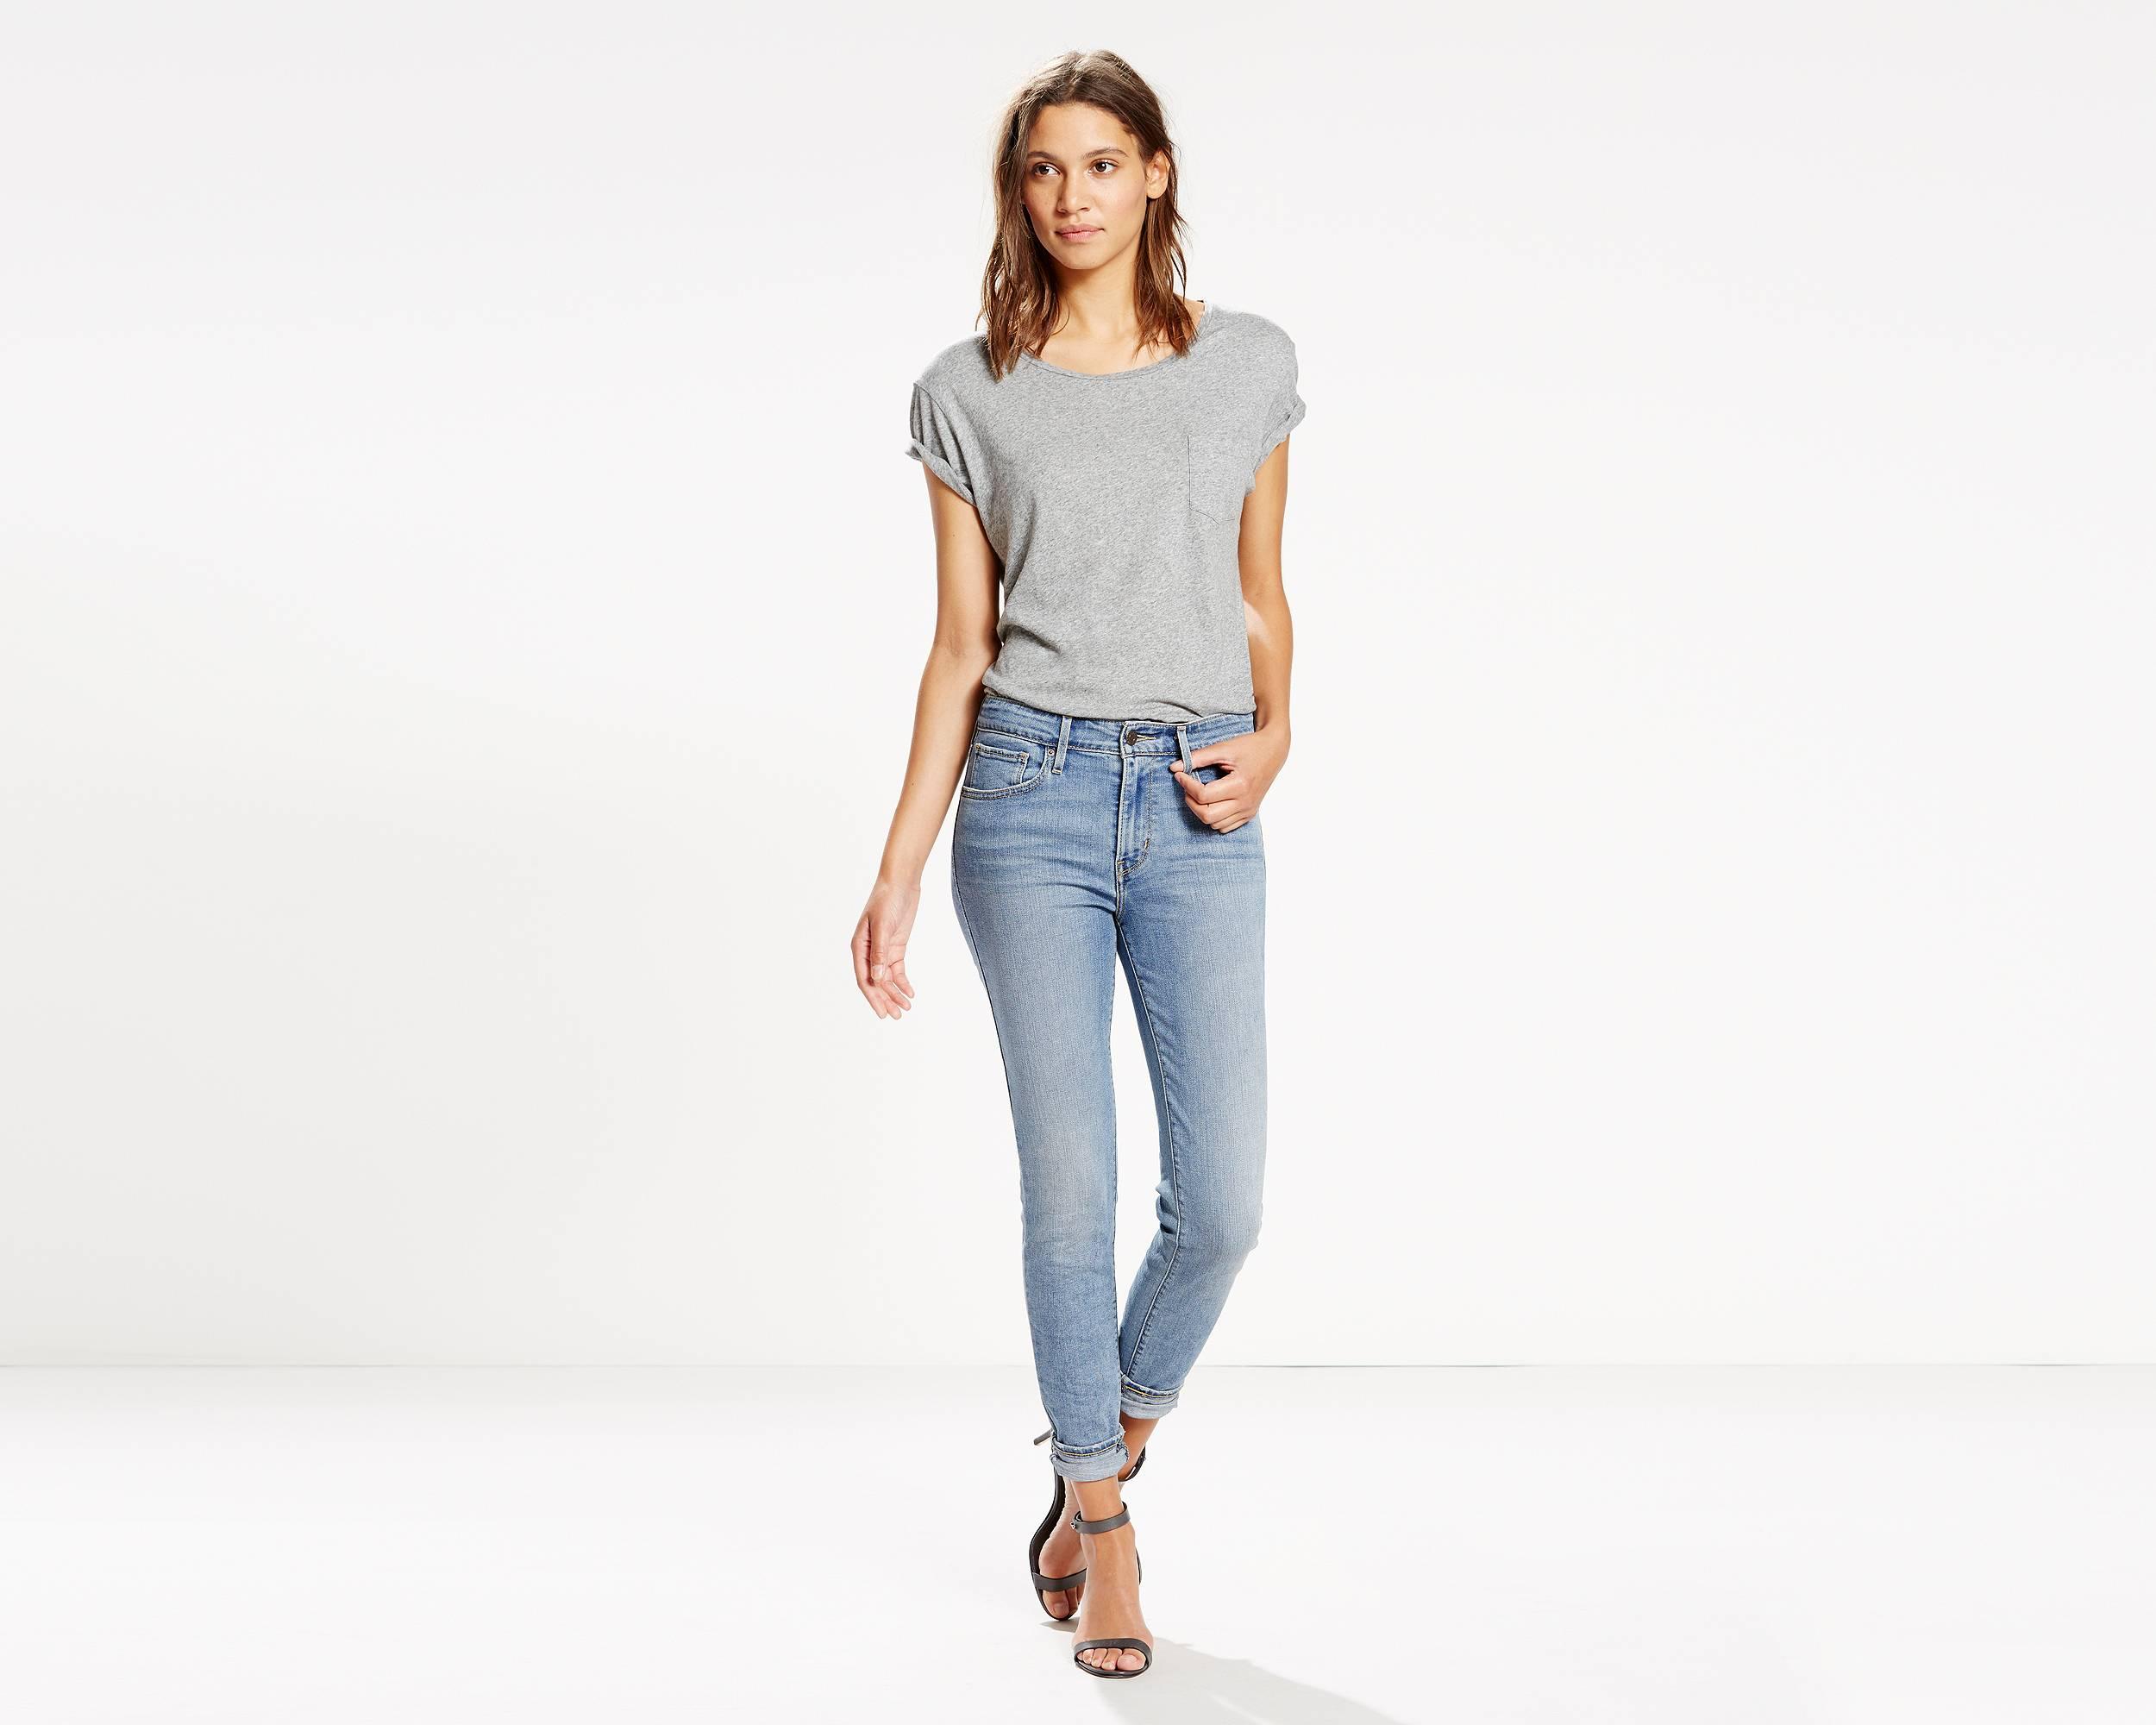 Levi's® Jeans, Jackets & Clothing | Levi's® (US) Official Site